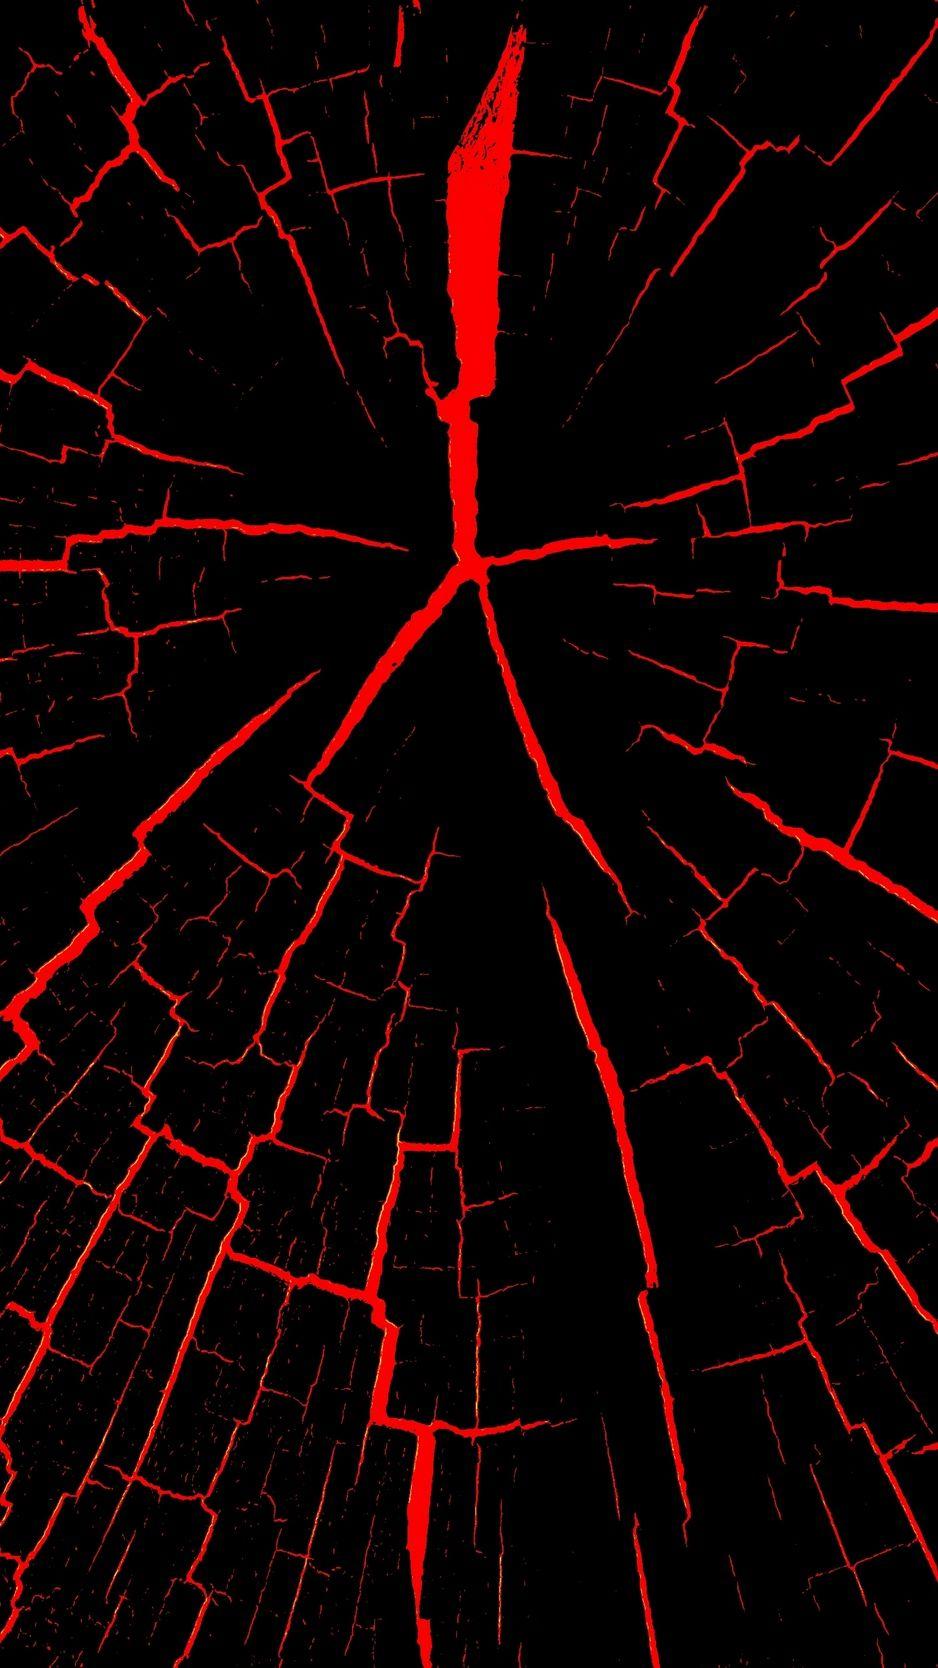 Cracks Red Black Wallpaper Background Iphone Red And Black Wallpaper Cracked Wallpaper Black Wallpaper